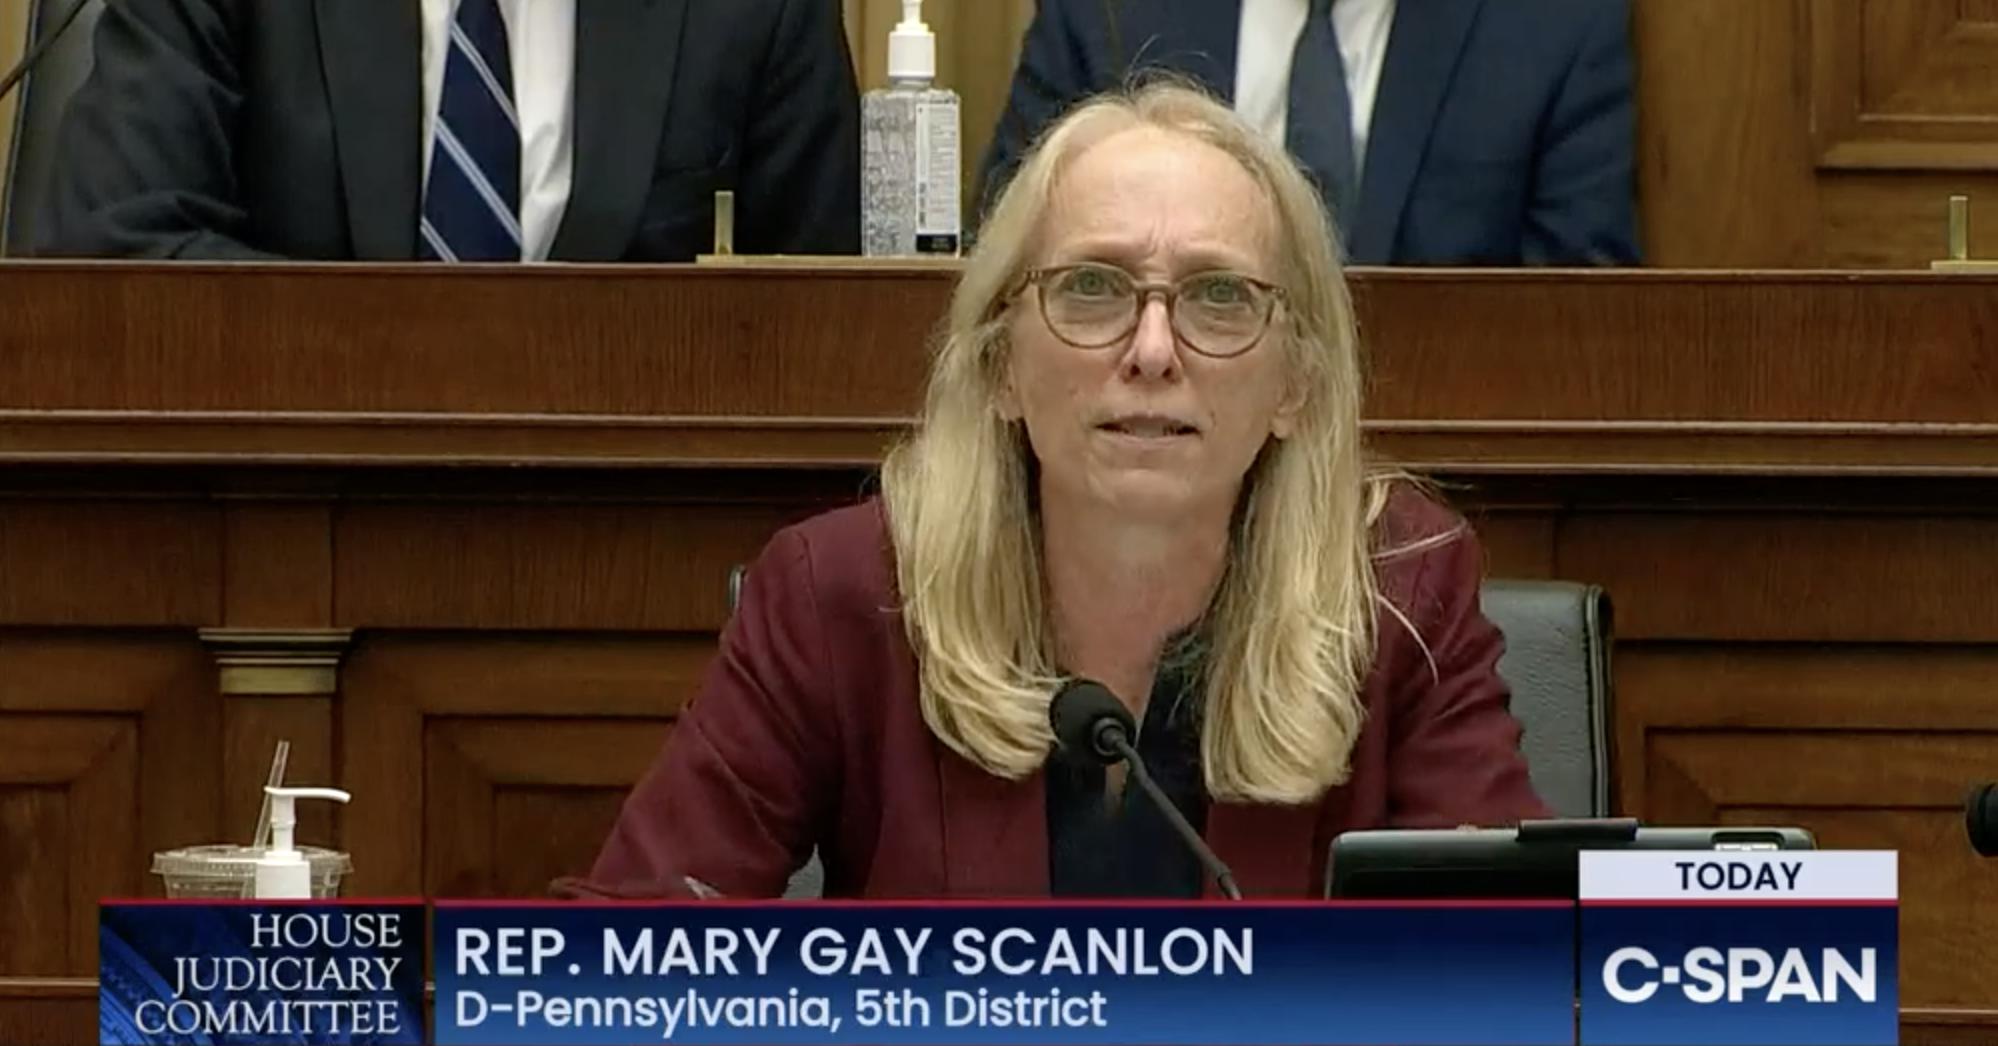 Rep. Mary Gay Scanlon